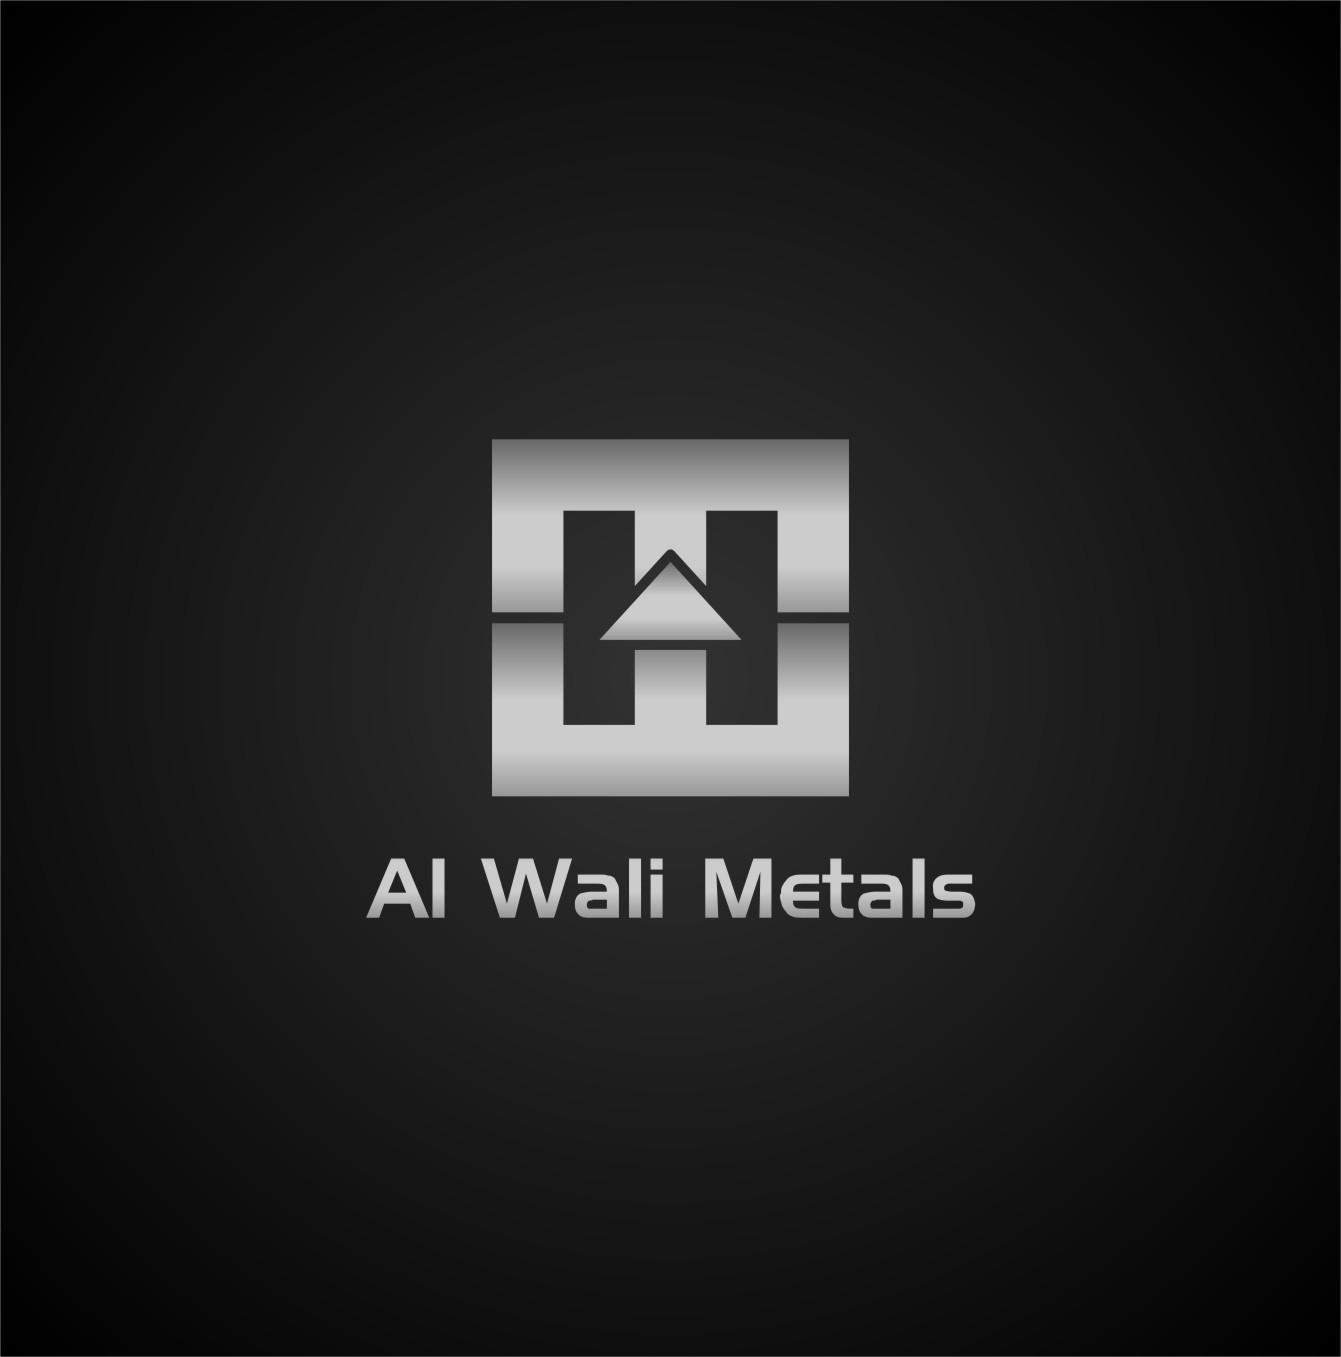 Logo Design by Ngepet_art - Entry No. 142 in the Logo Design Contest Inspiring Logo Design for Al Wali Metals.